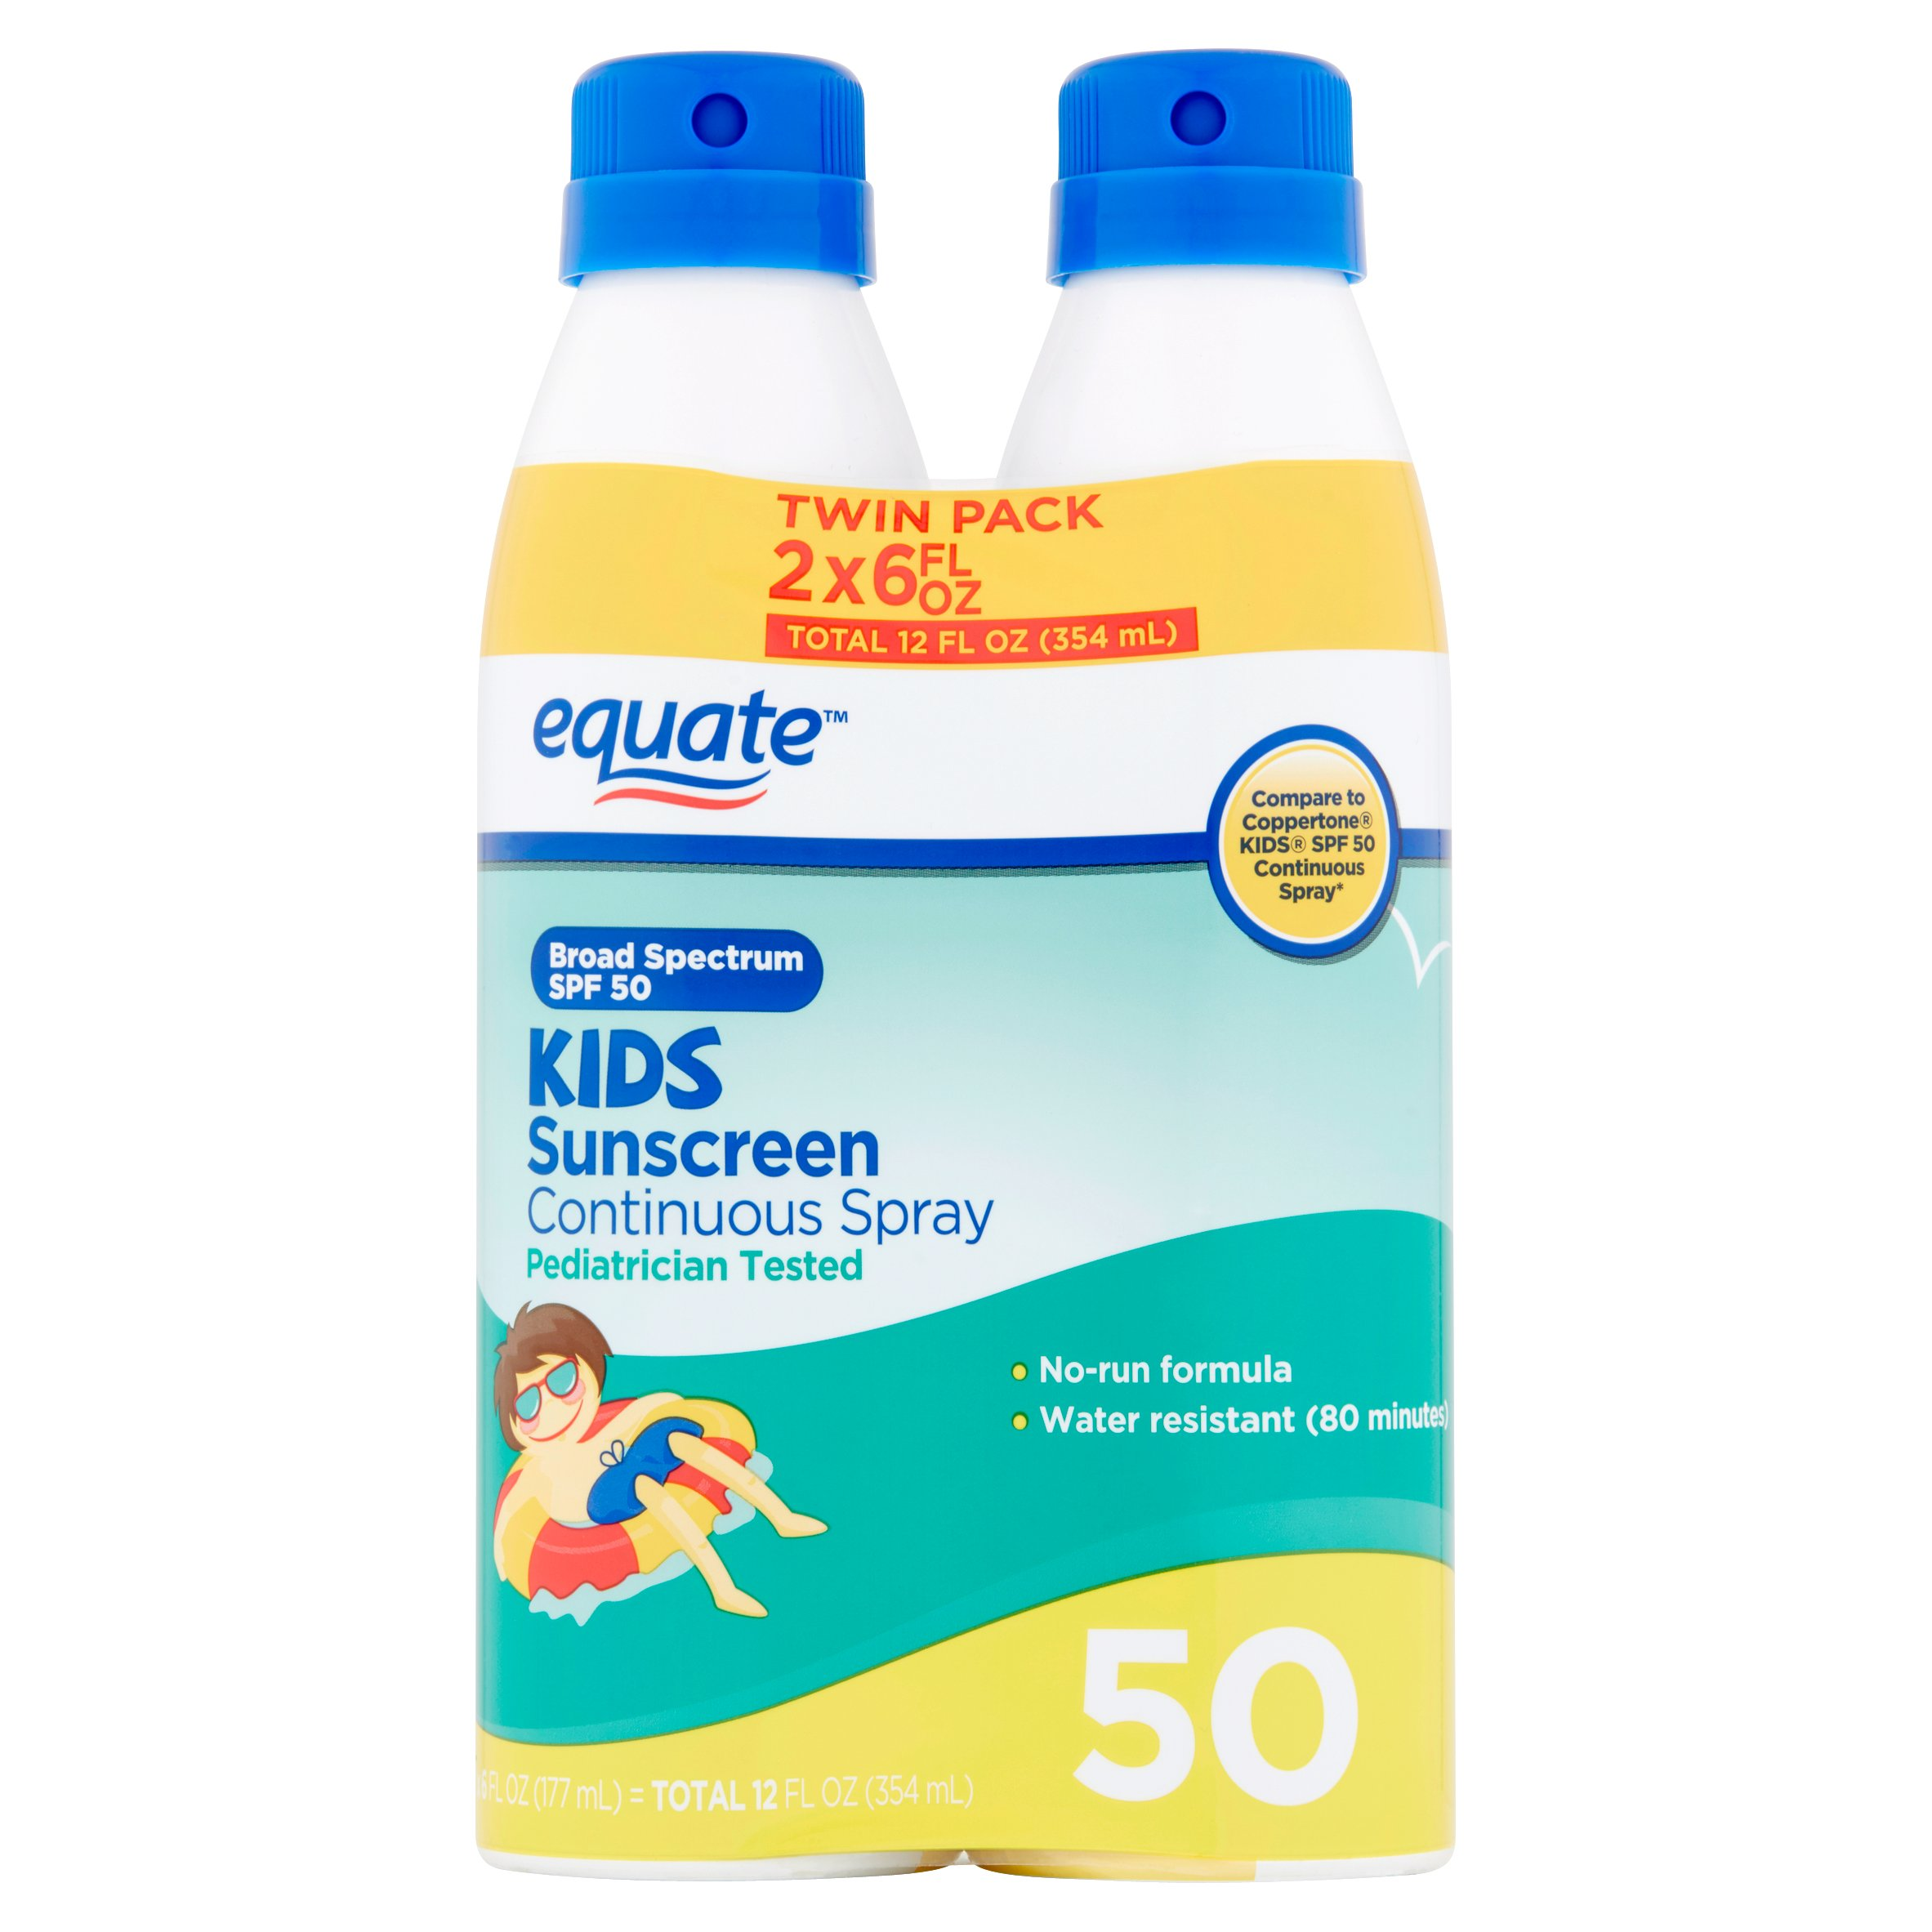 Equate Kids Sunscreen Continuous Spray Broad Spectrum, SPF 50, 6 Fl Oz, 2 Pk